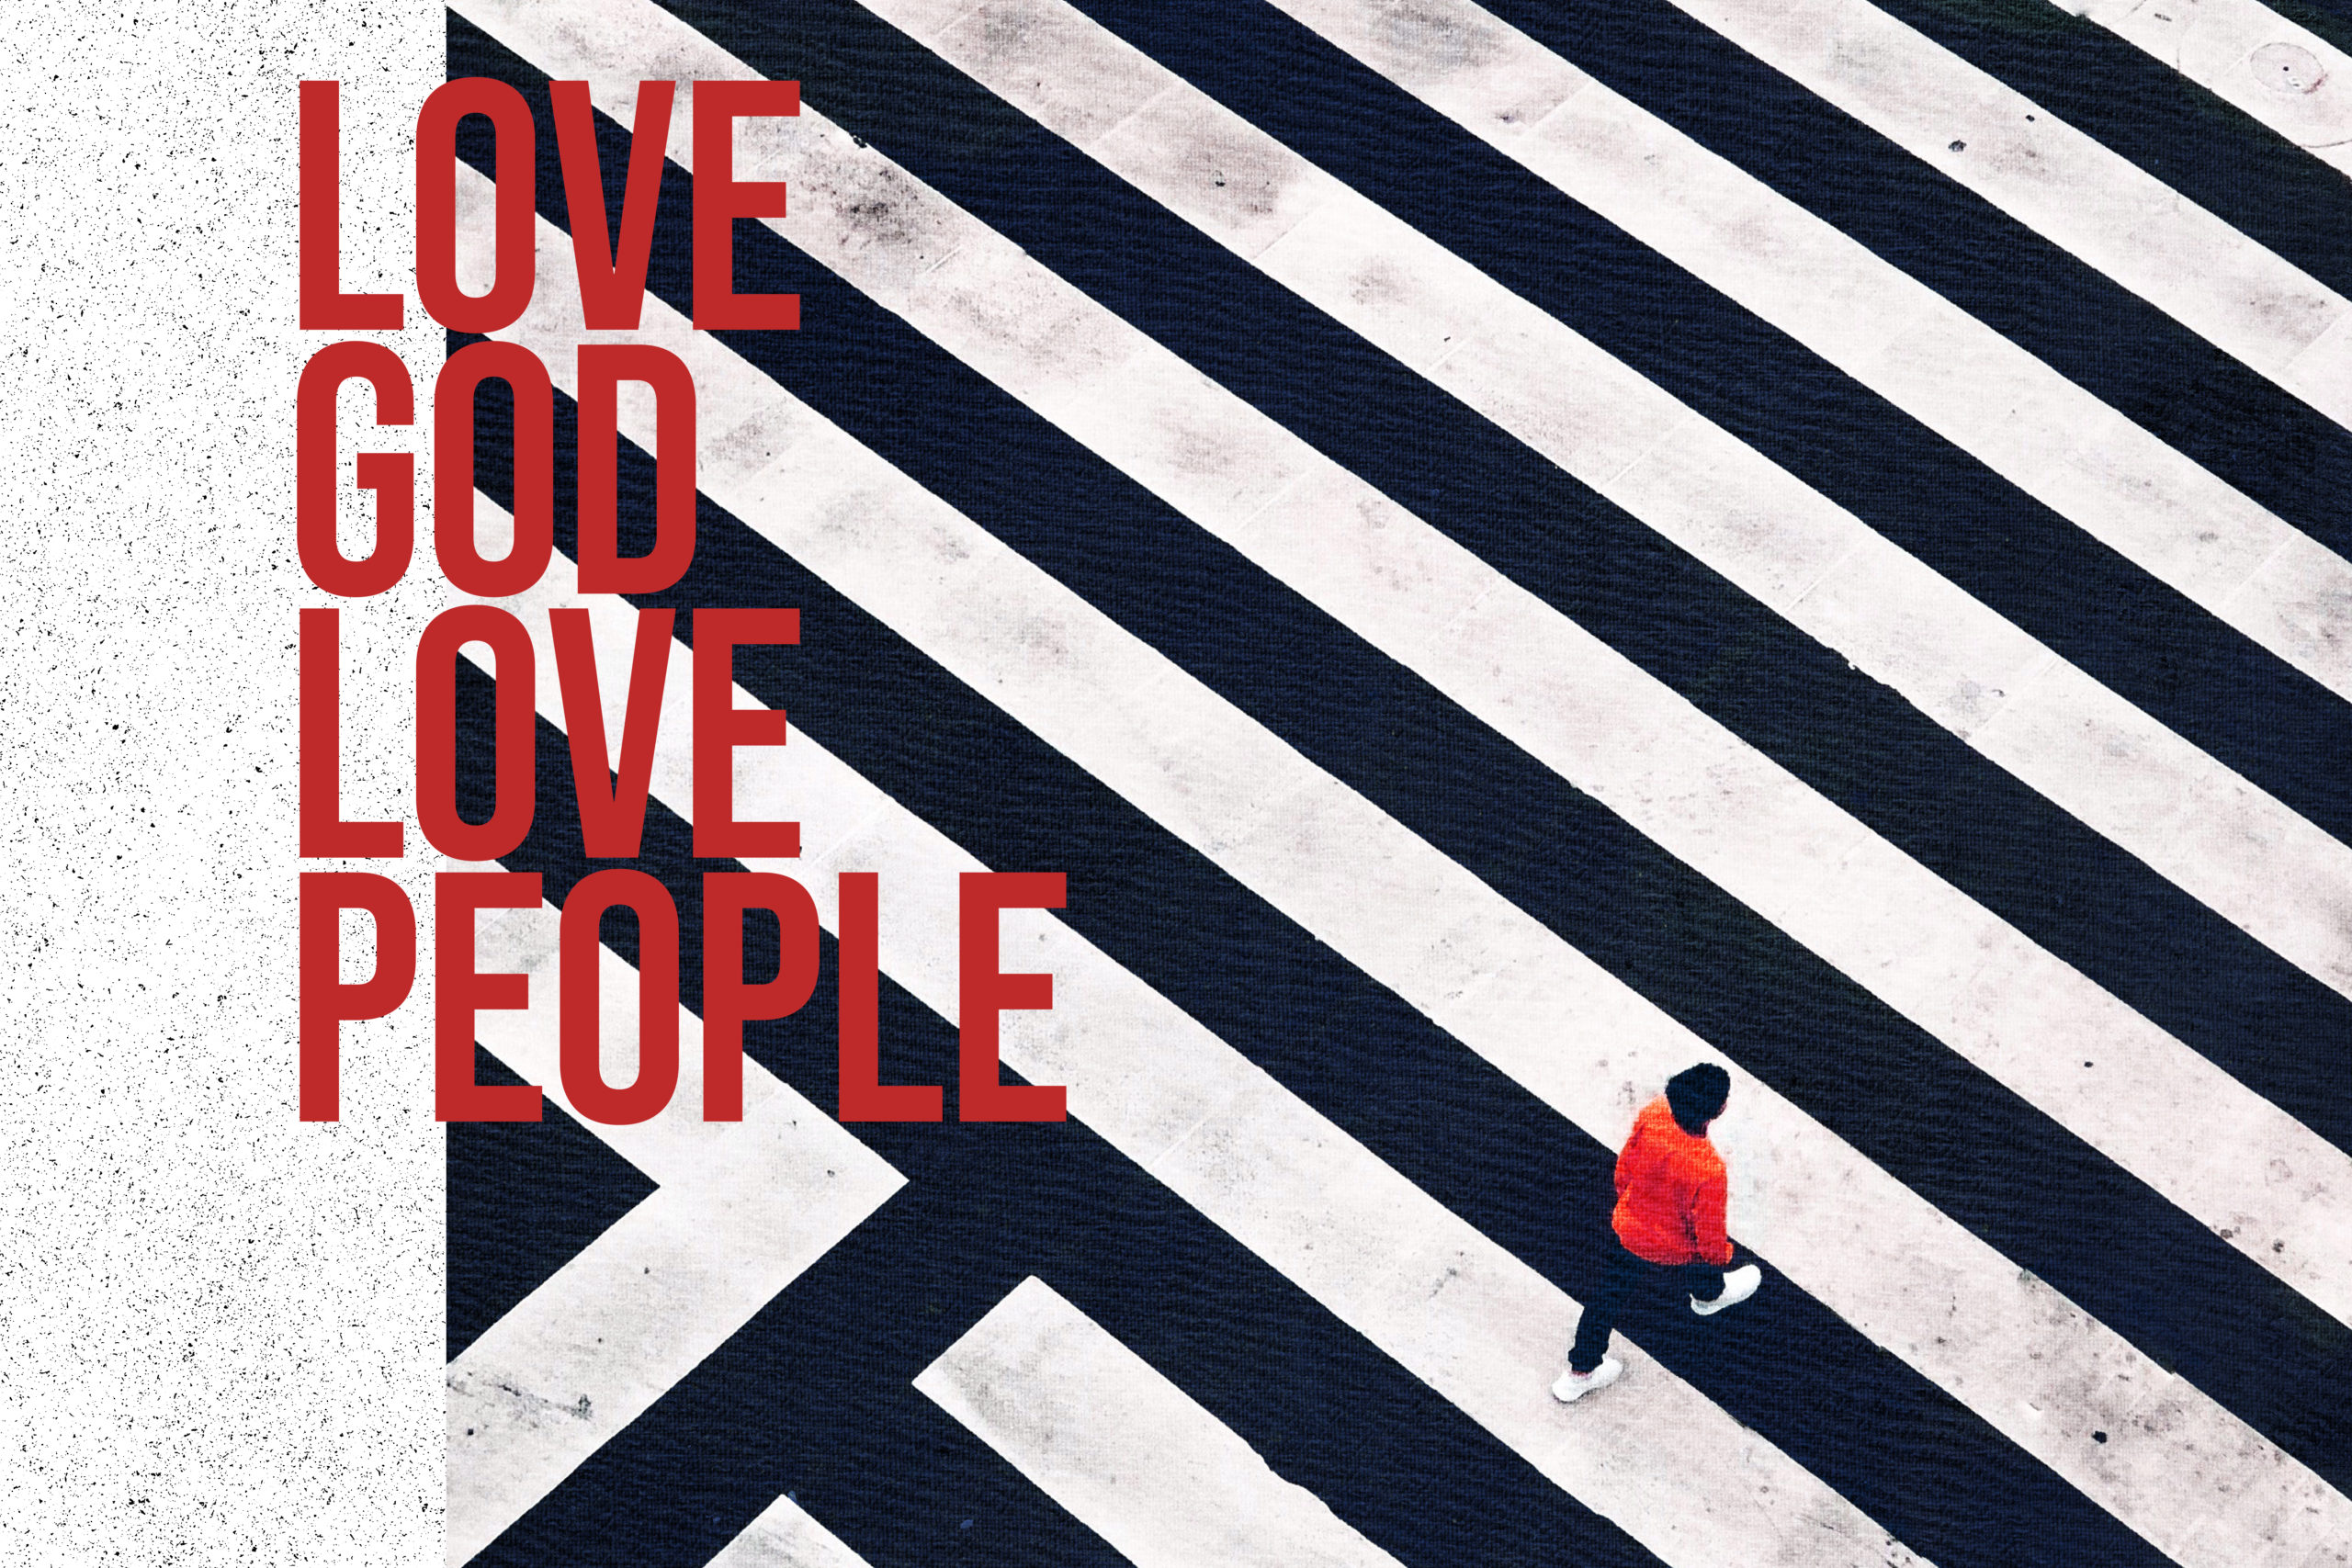 H2H Jugendgottesdienst Love God Love People Öschelbronn Niefern-Öschelbronn Enzkreis Gottesdienst Jugendarbeit